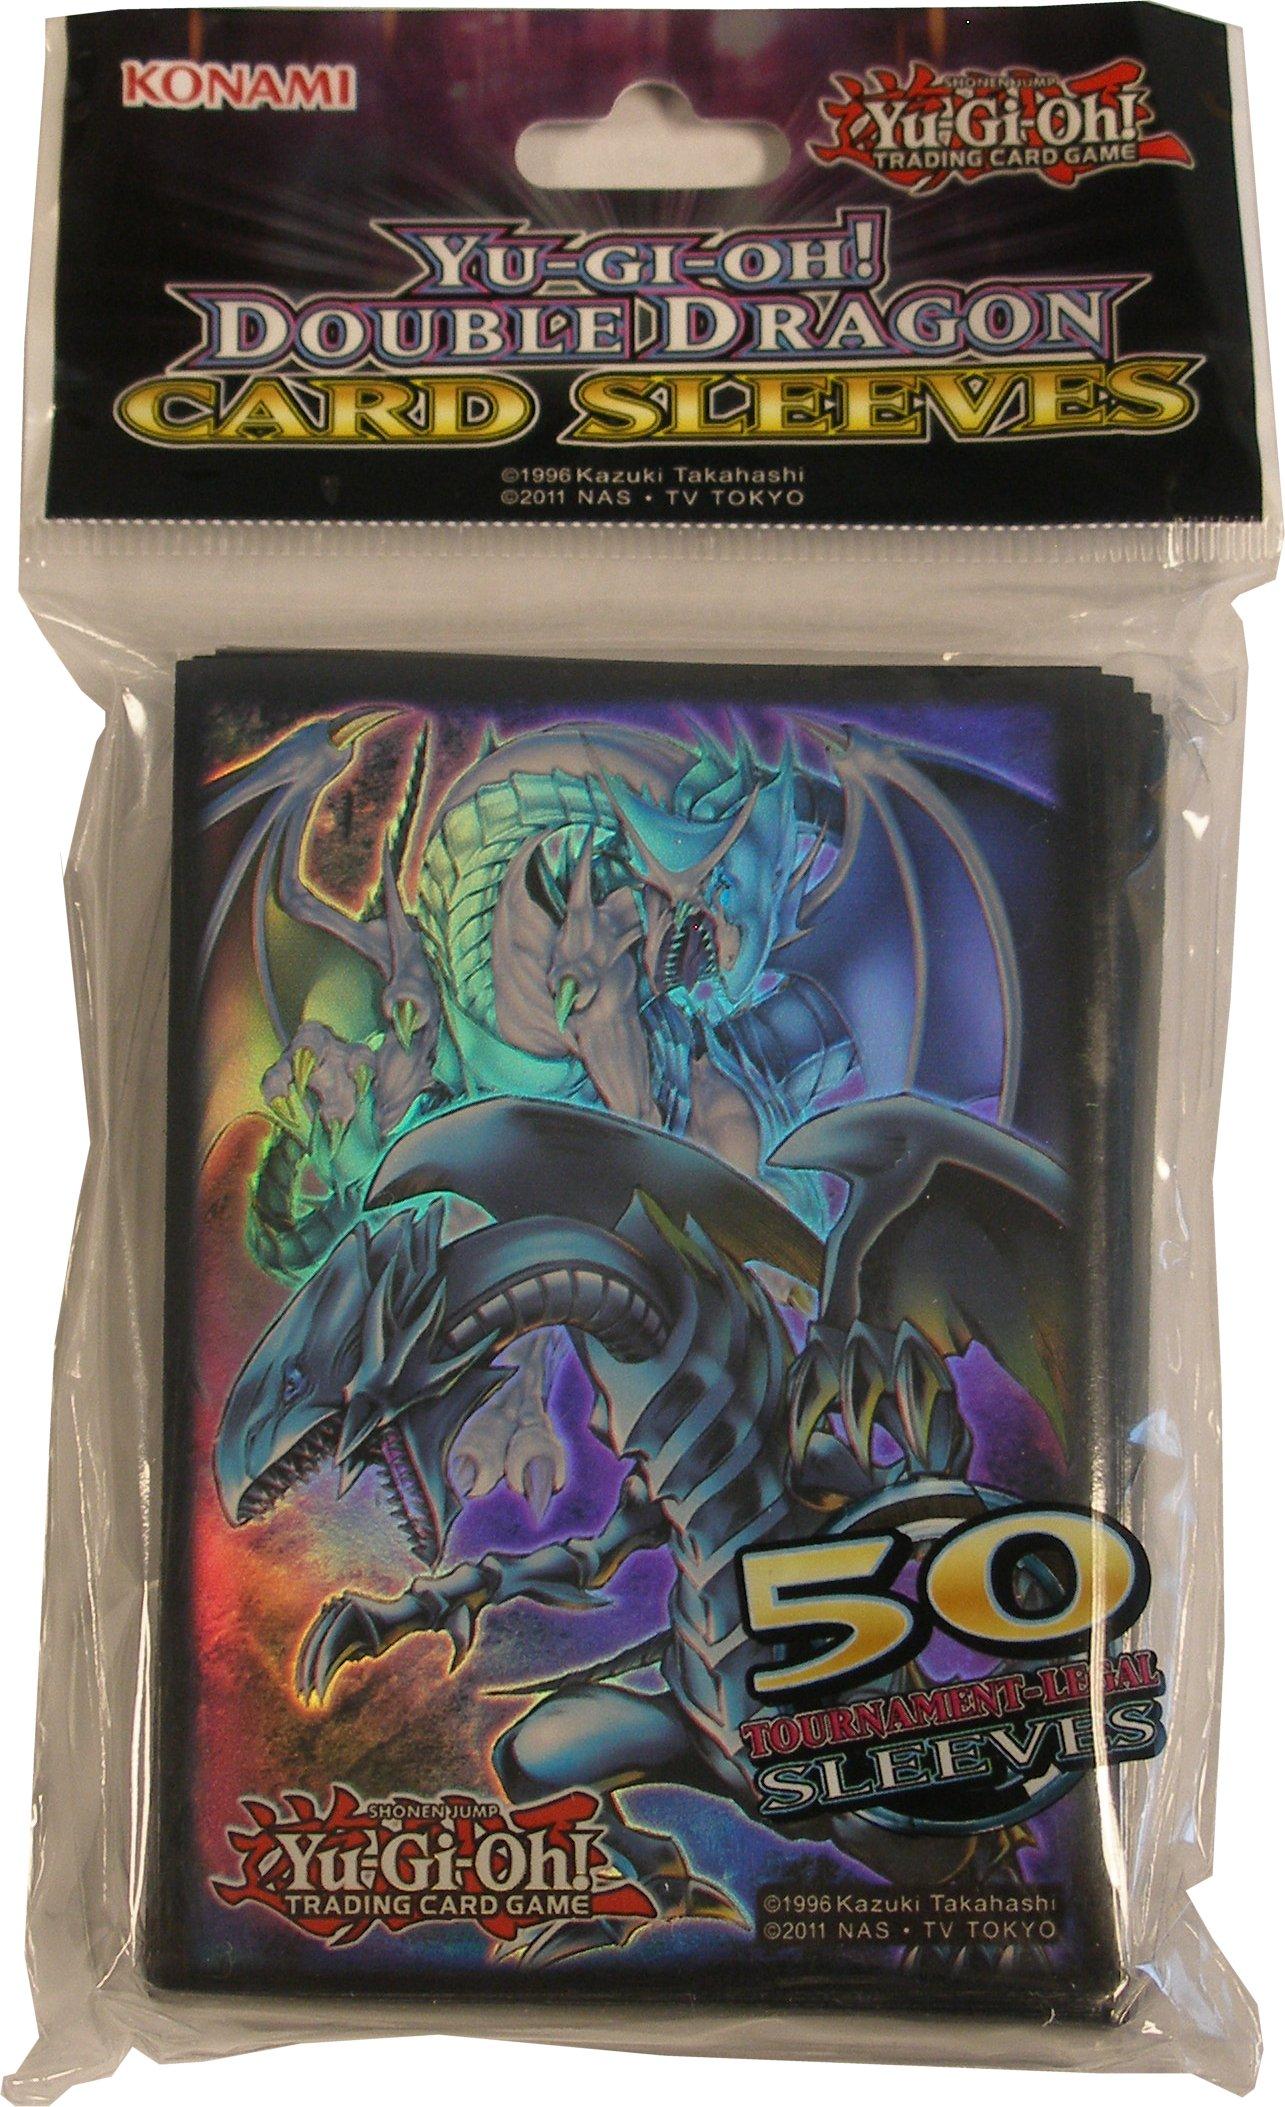 konami yu gi oh double dragon card sleeves deck protectors box